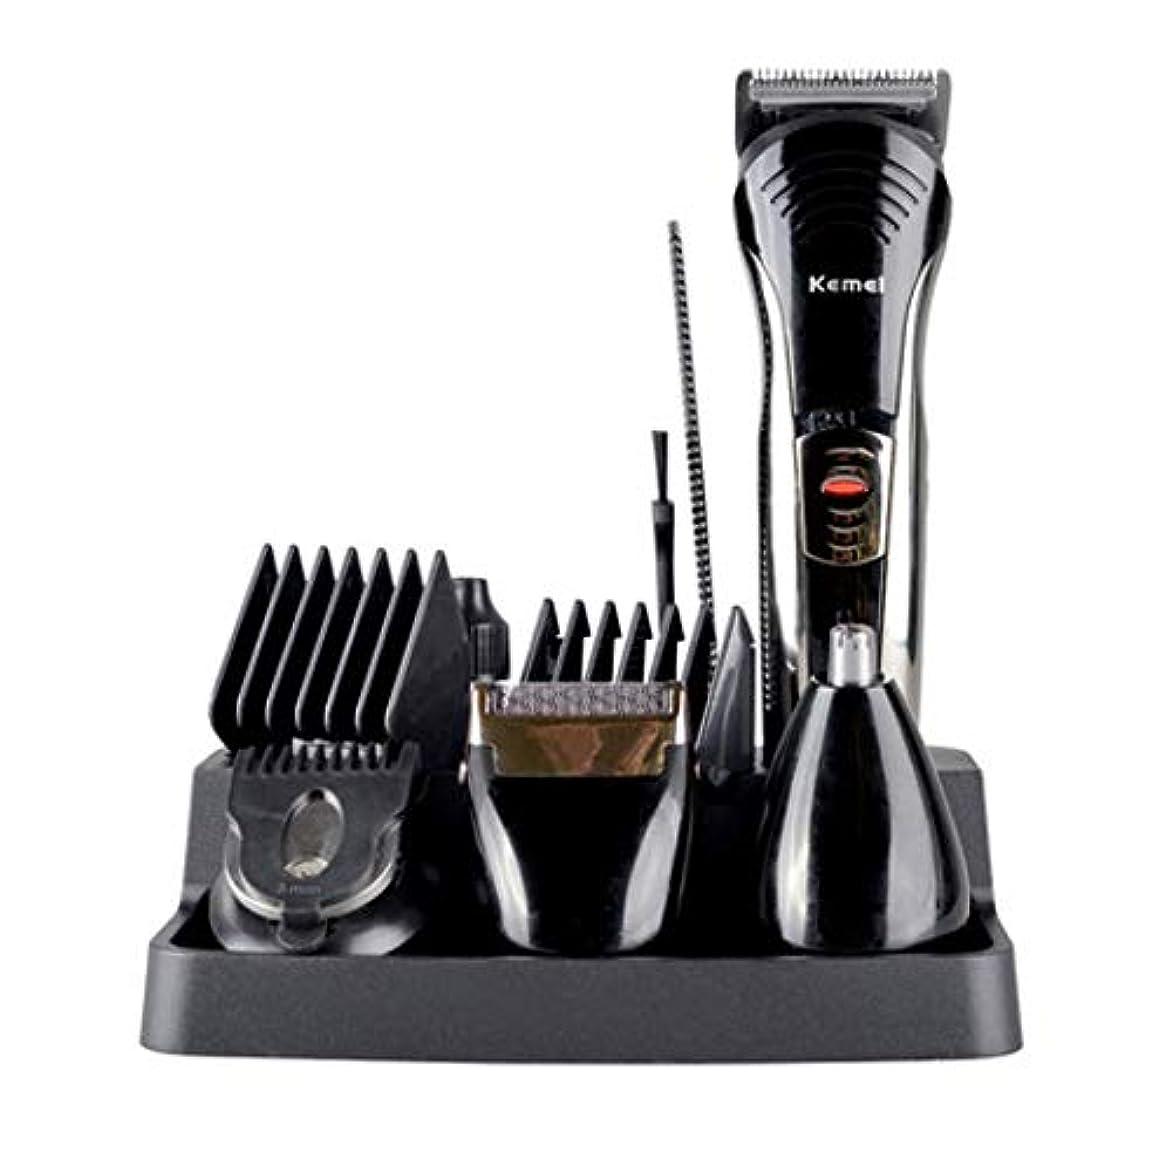 QINJLI 多機能電気髪クリッパー シェーバー鼻髪ナイフ コーナー ナイフ プロフェッショナル ベースかみそりストレージ